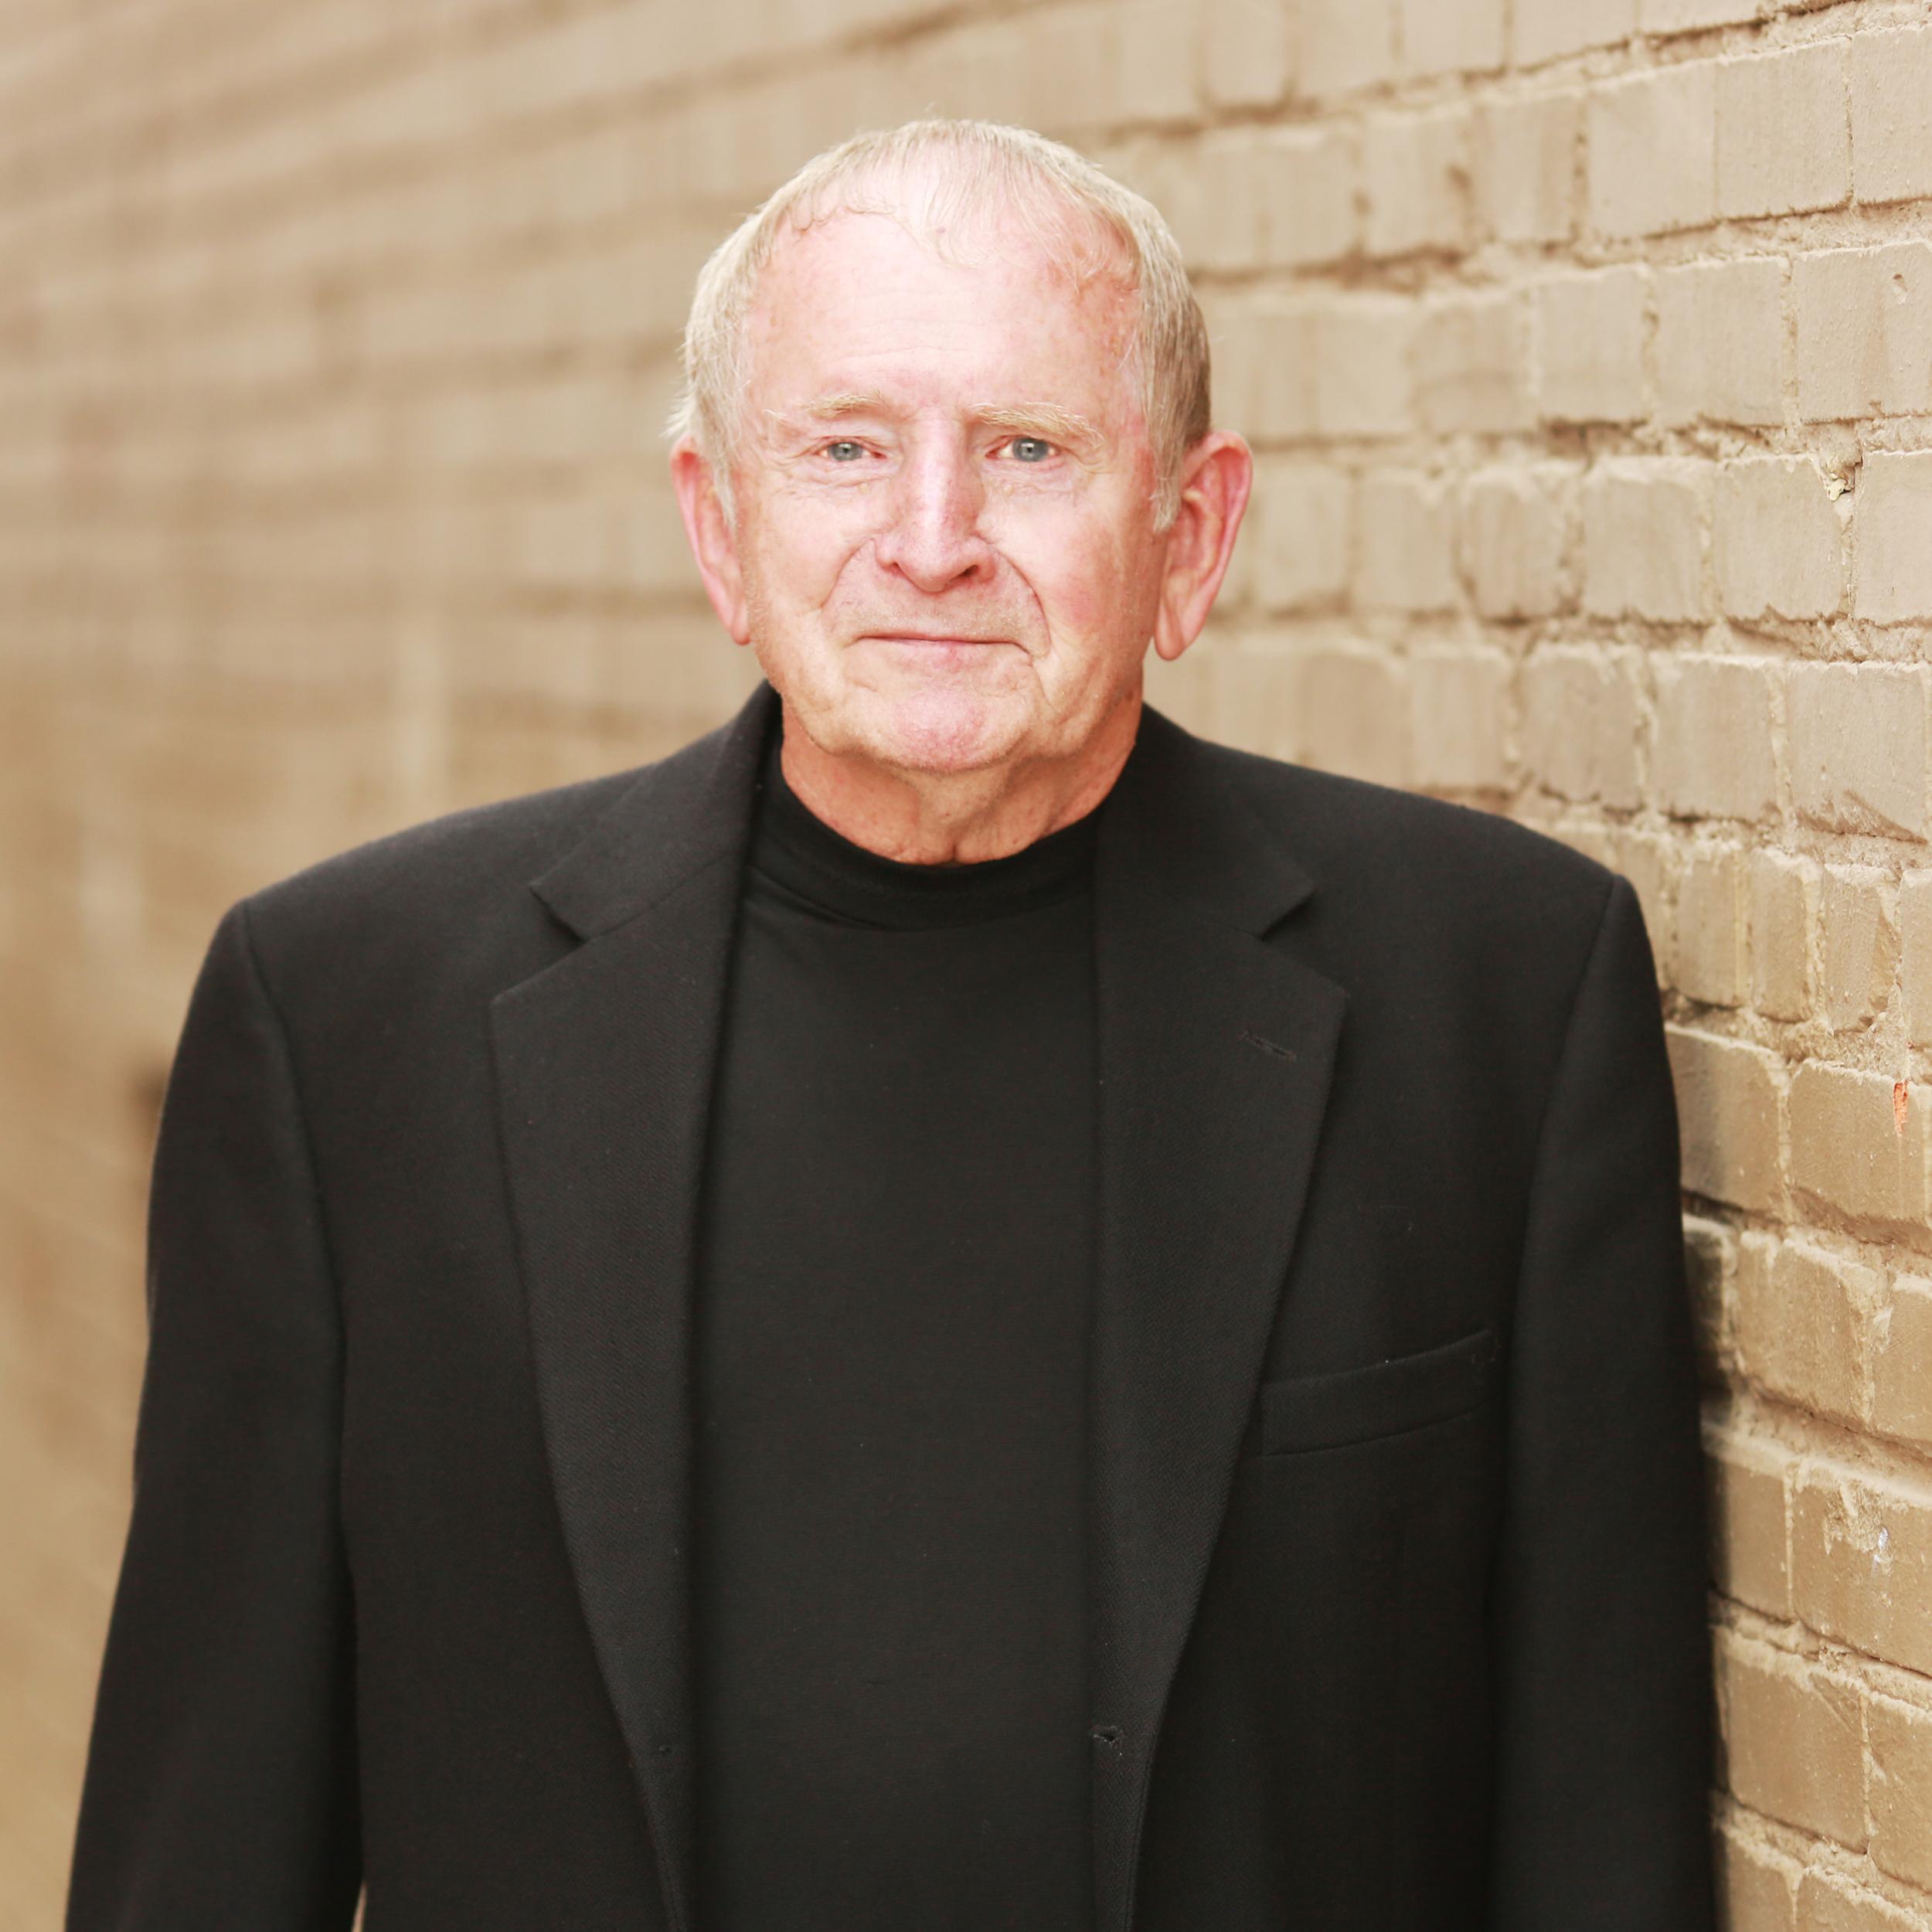 Frank Hall